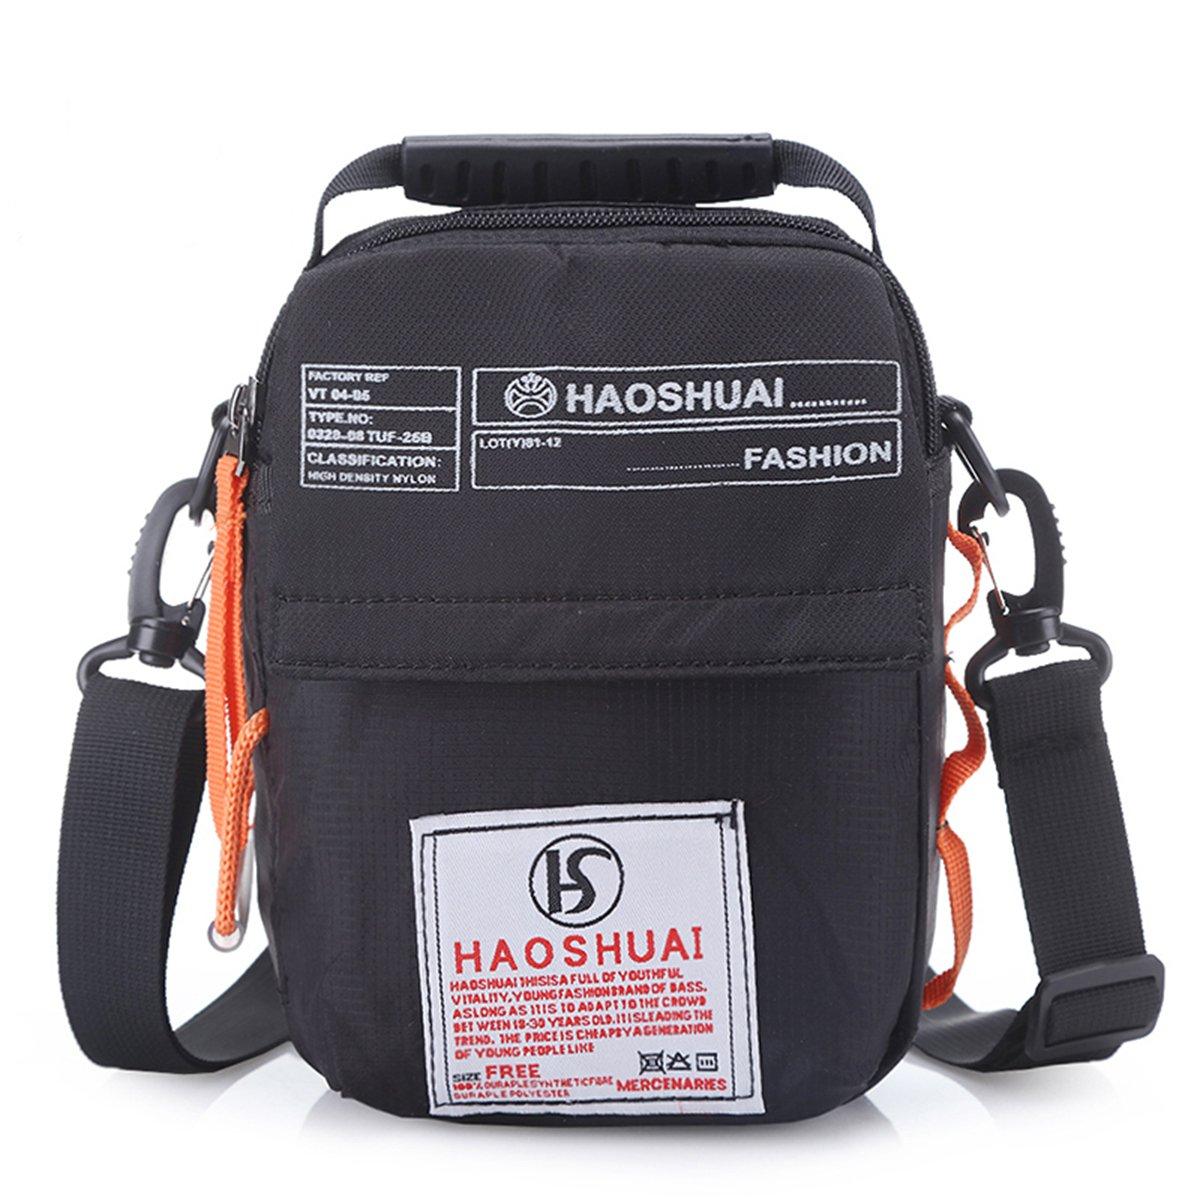 JAKAGO Waterproof Shoulder Bag Universal Small Messenger Bag Handbag Mobile Phone Pouch Cross Body Bag Purse with Shoulder Strap for Outdoor Sport Travel Hiking Camping (Black)